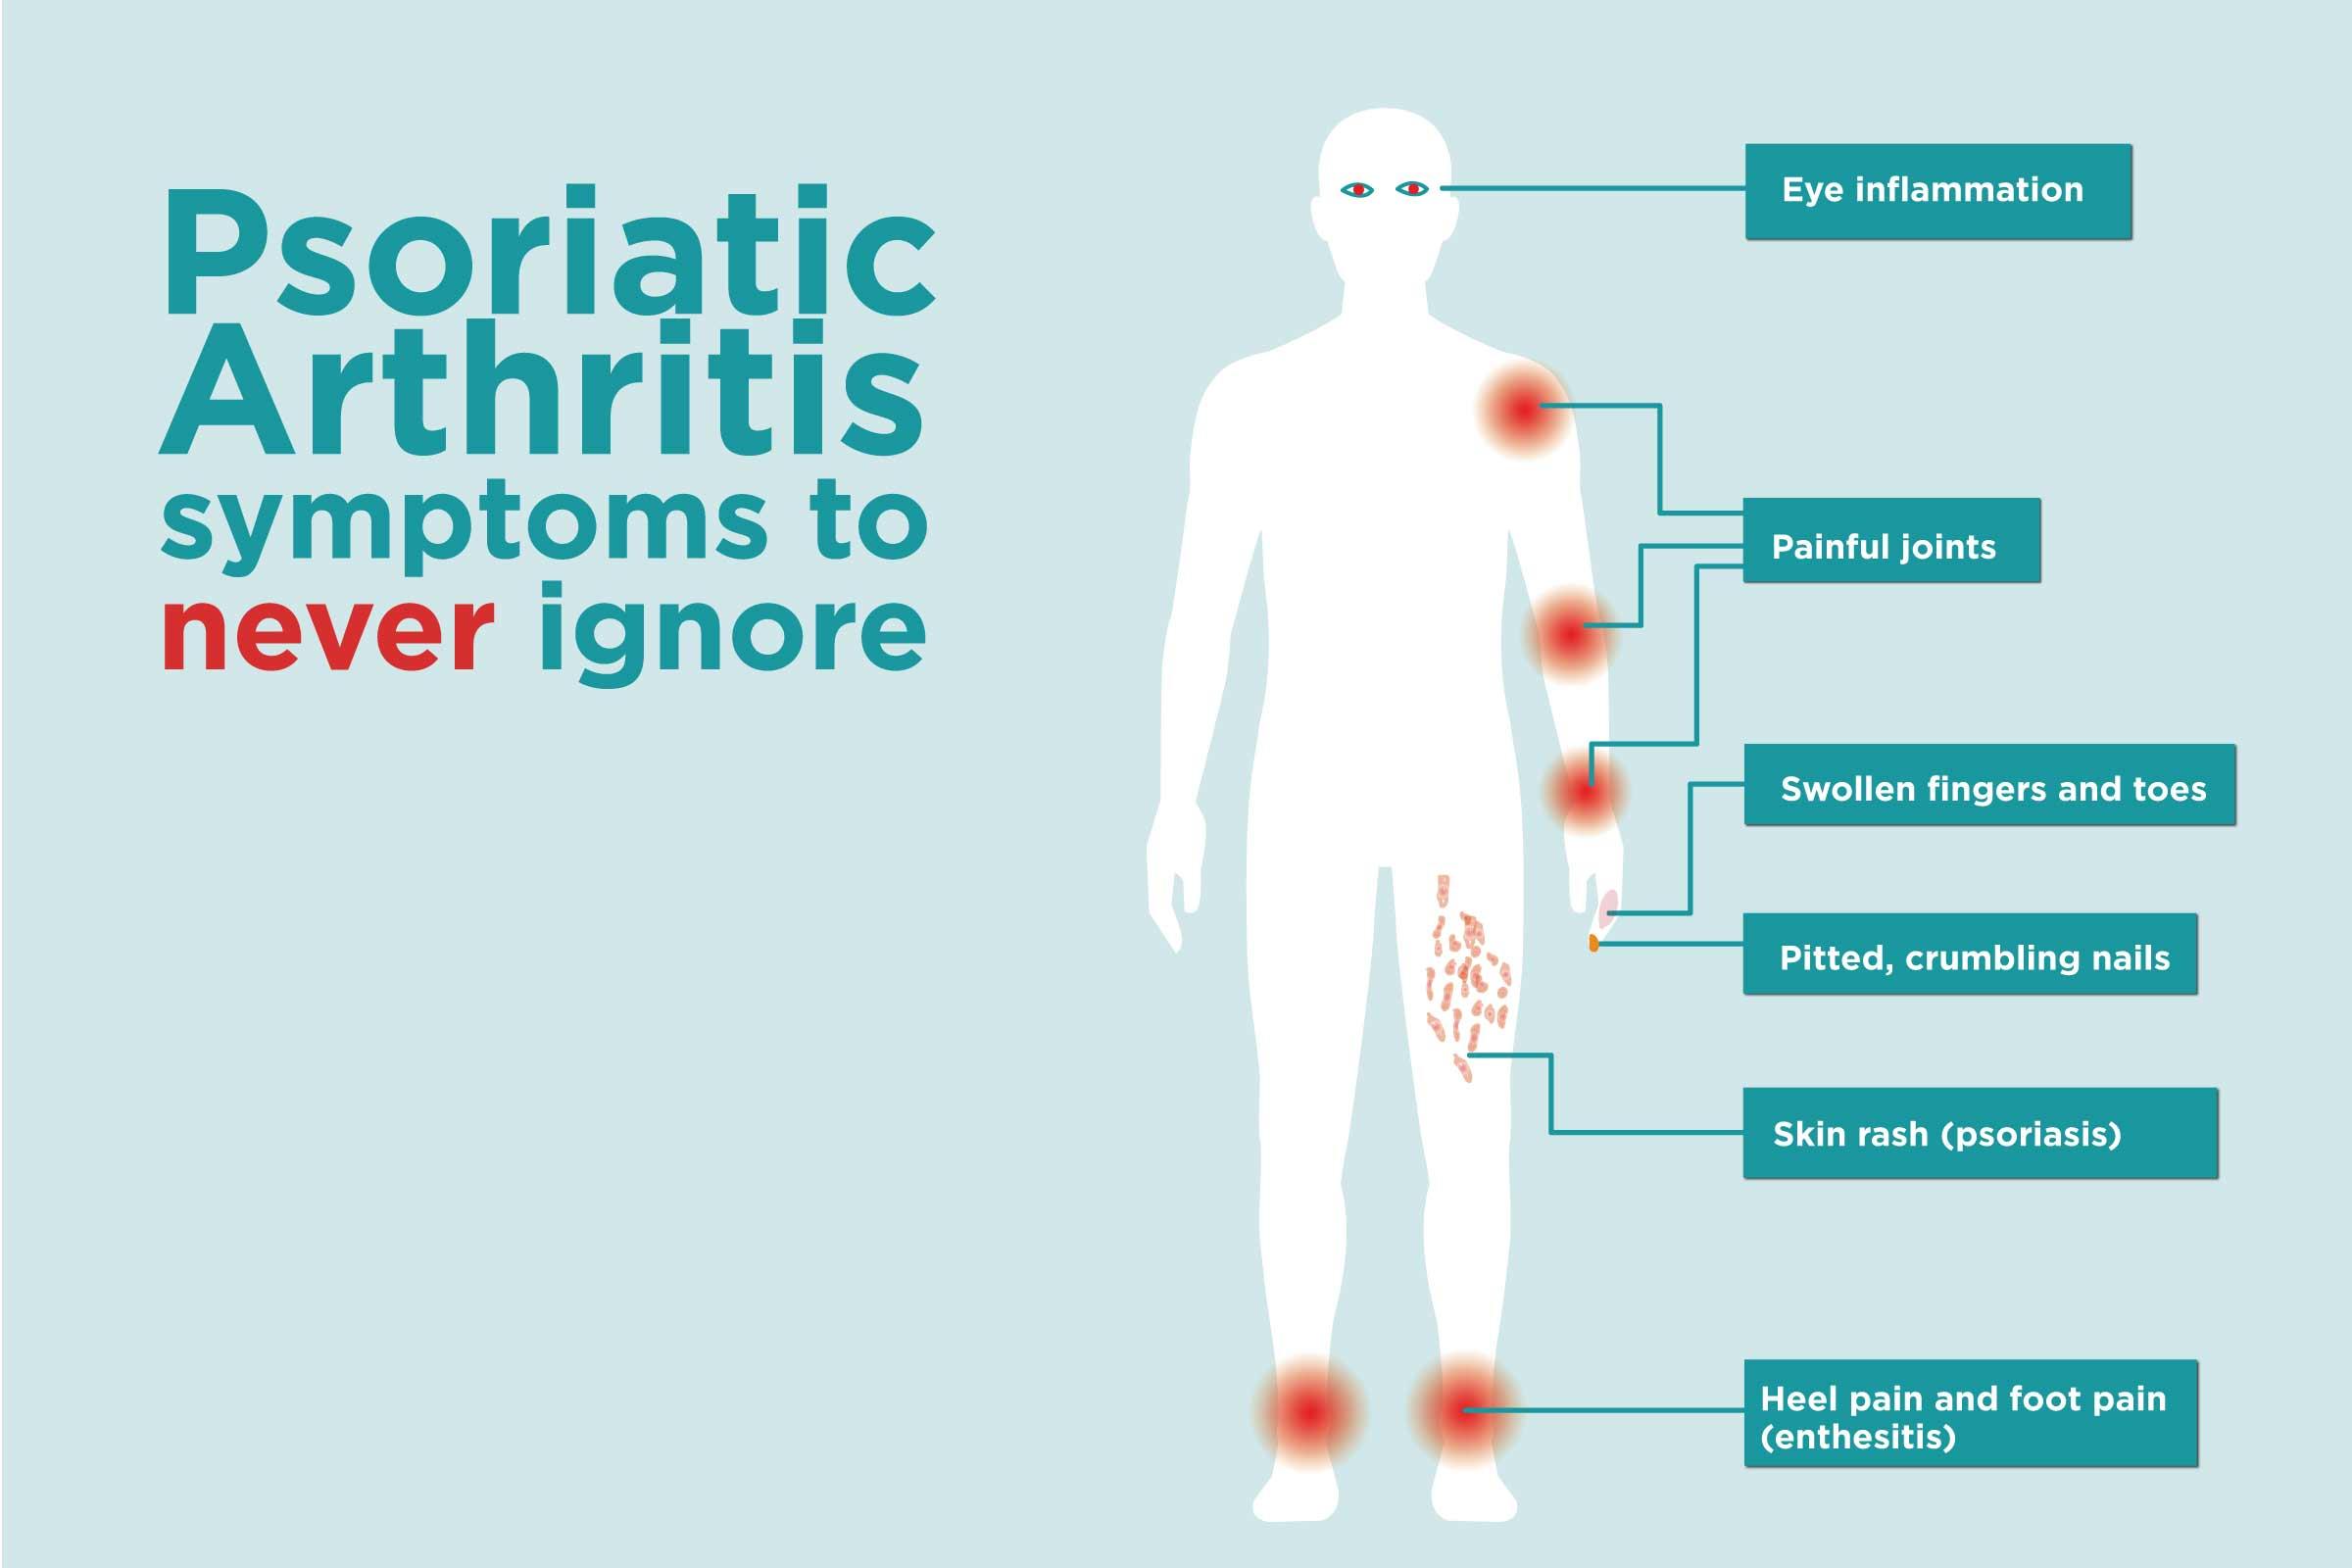 Asztma Psoriasis Arthritis | Sanidex Magyarországon